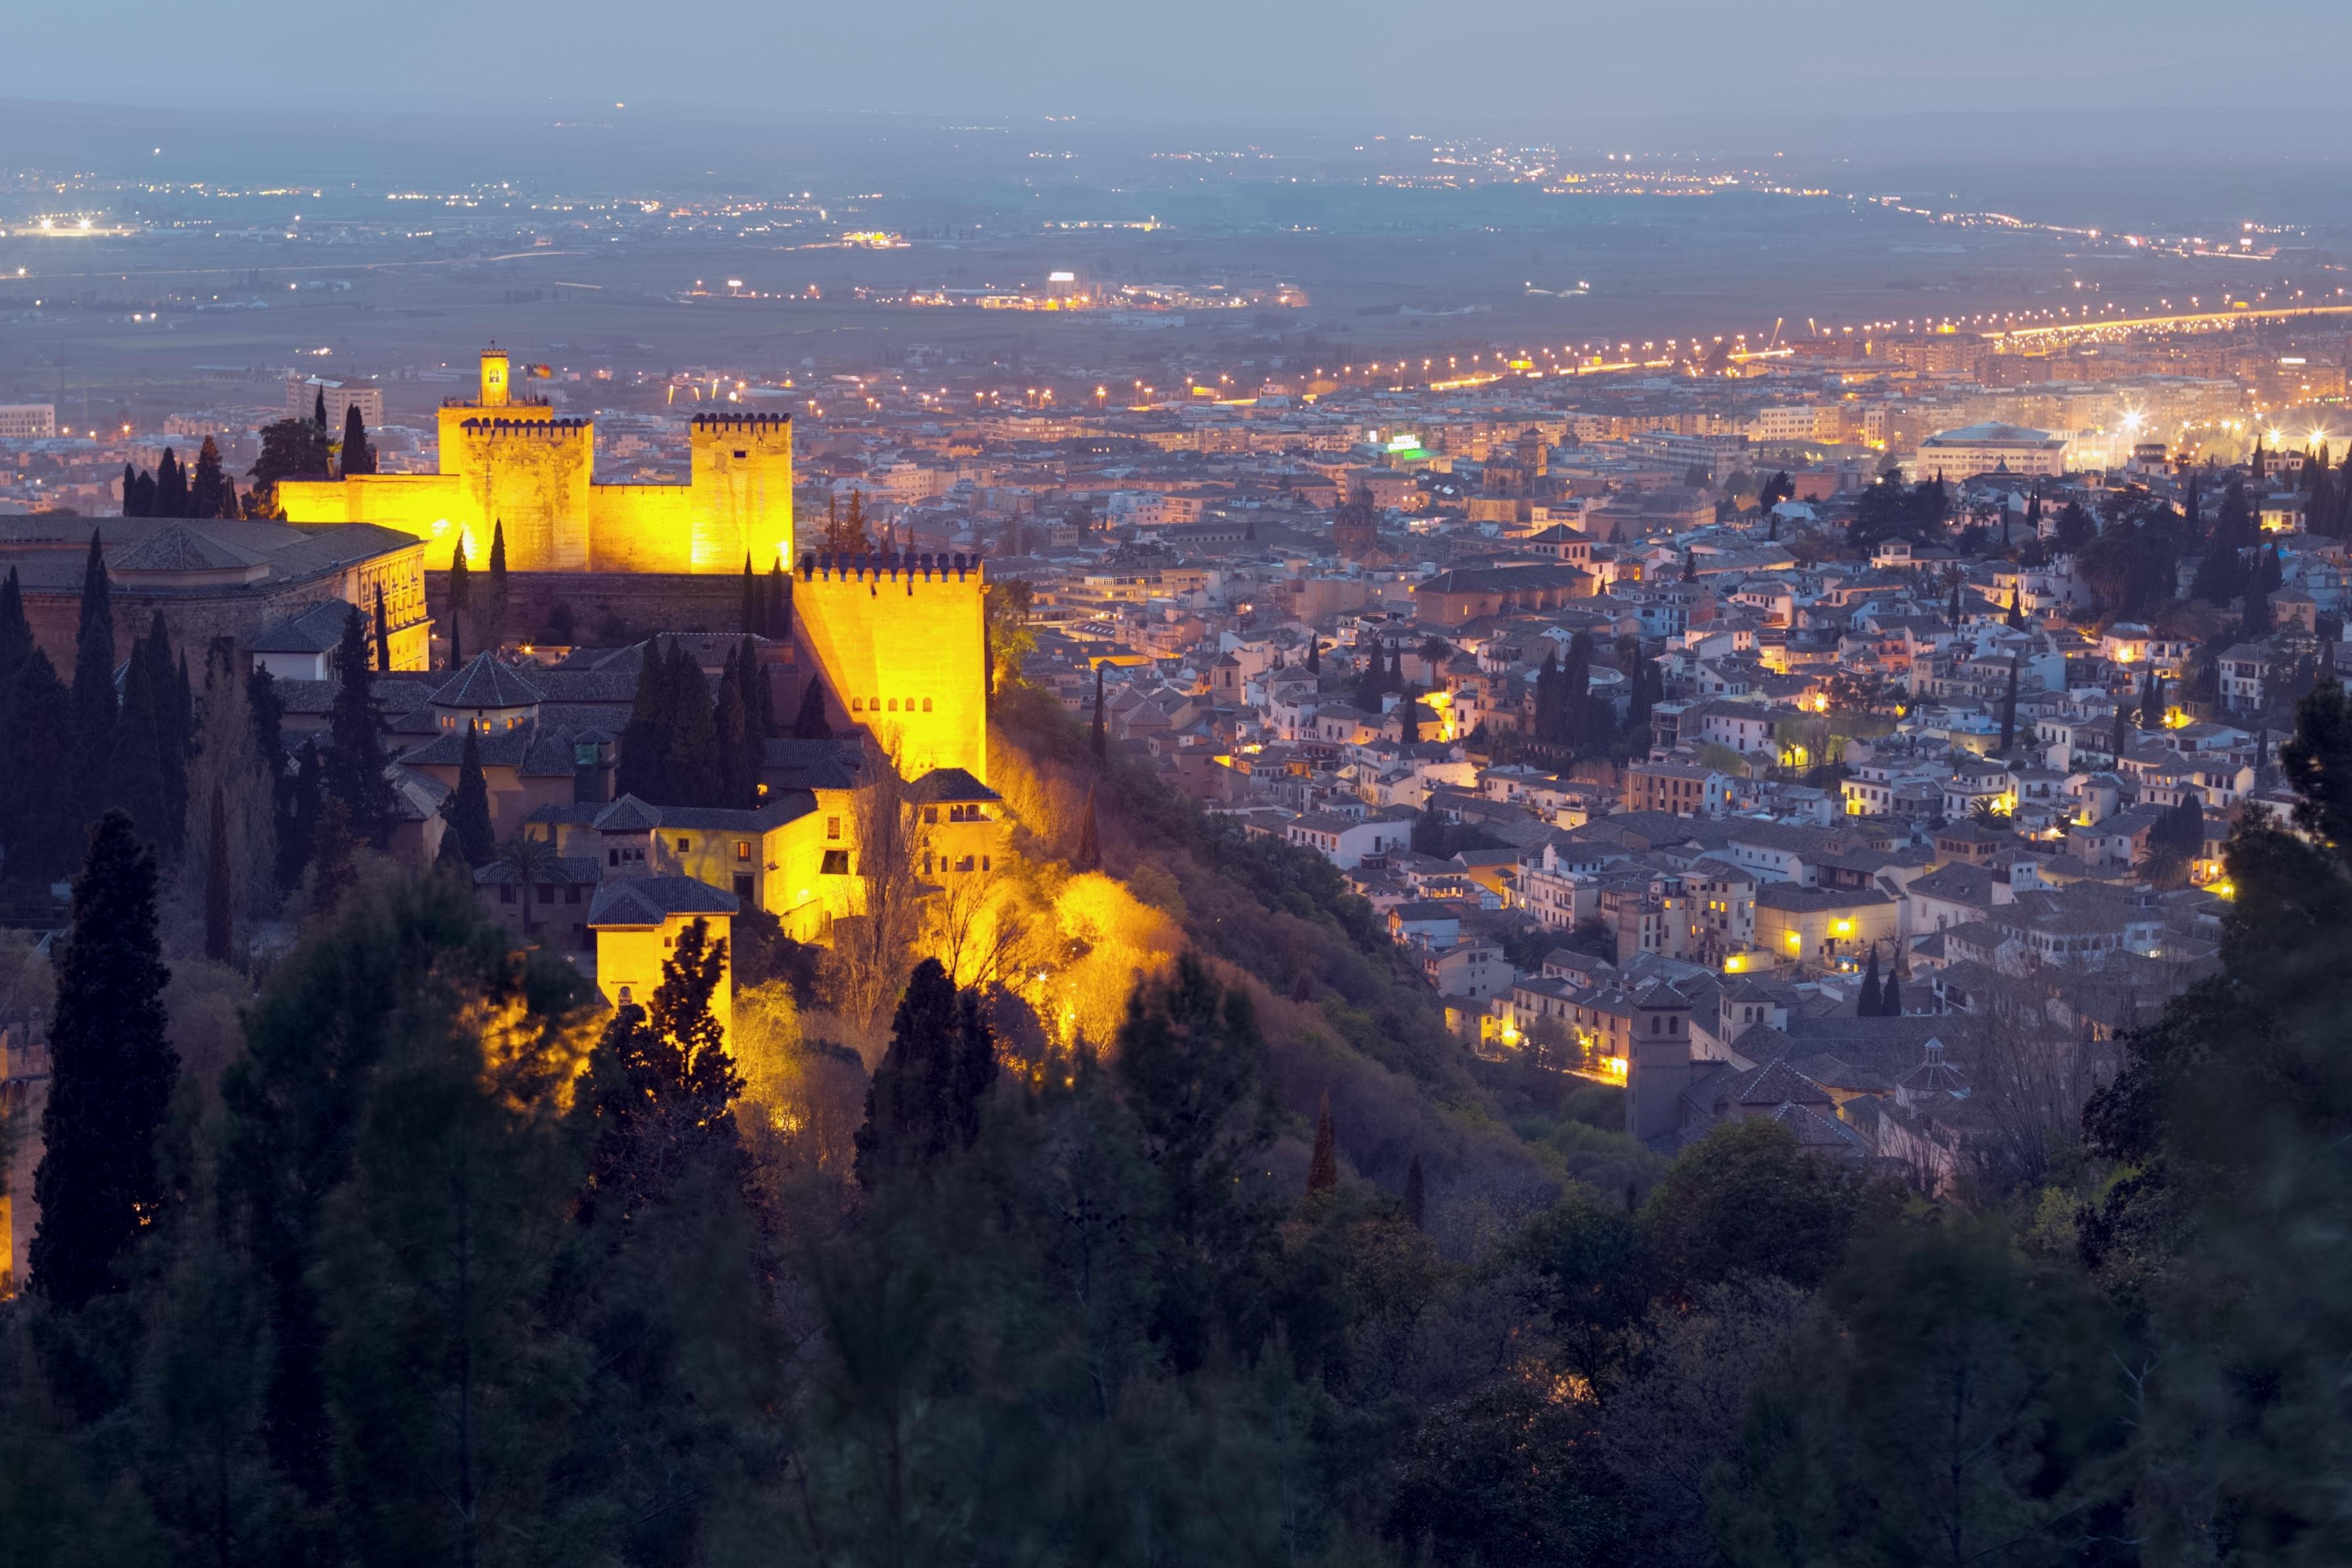 Vista notturna Alhambra